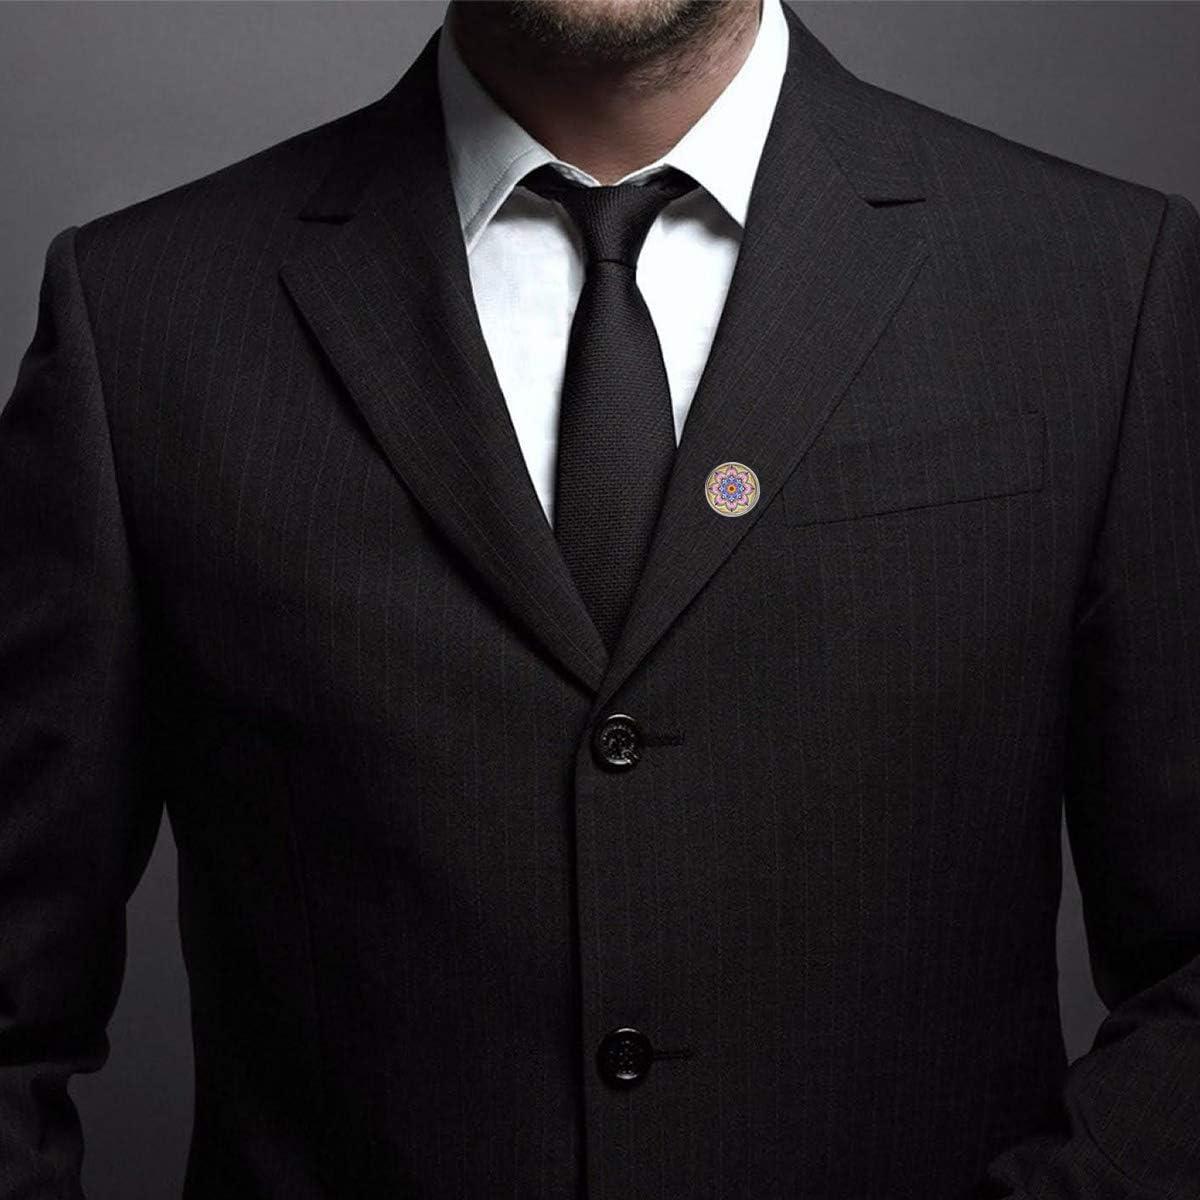 Custom Lapel Pin Brooches Buddhism Zen Banquet Badge Pins Trendy Accessory Jacket T-Shirt Bag Hat Shoe